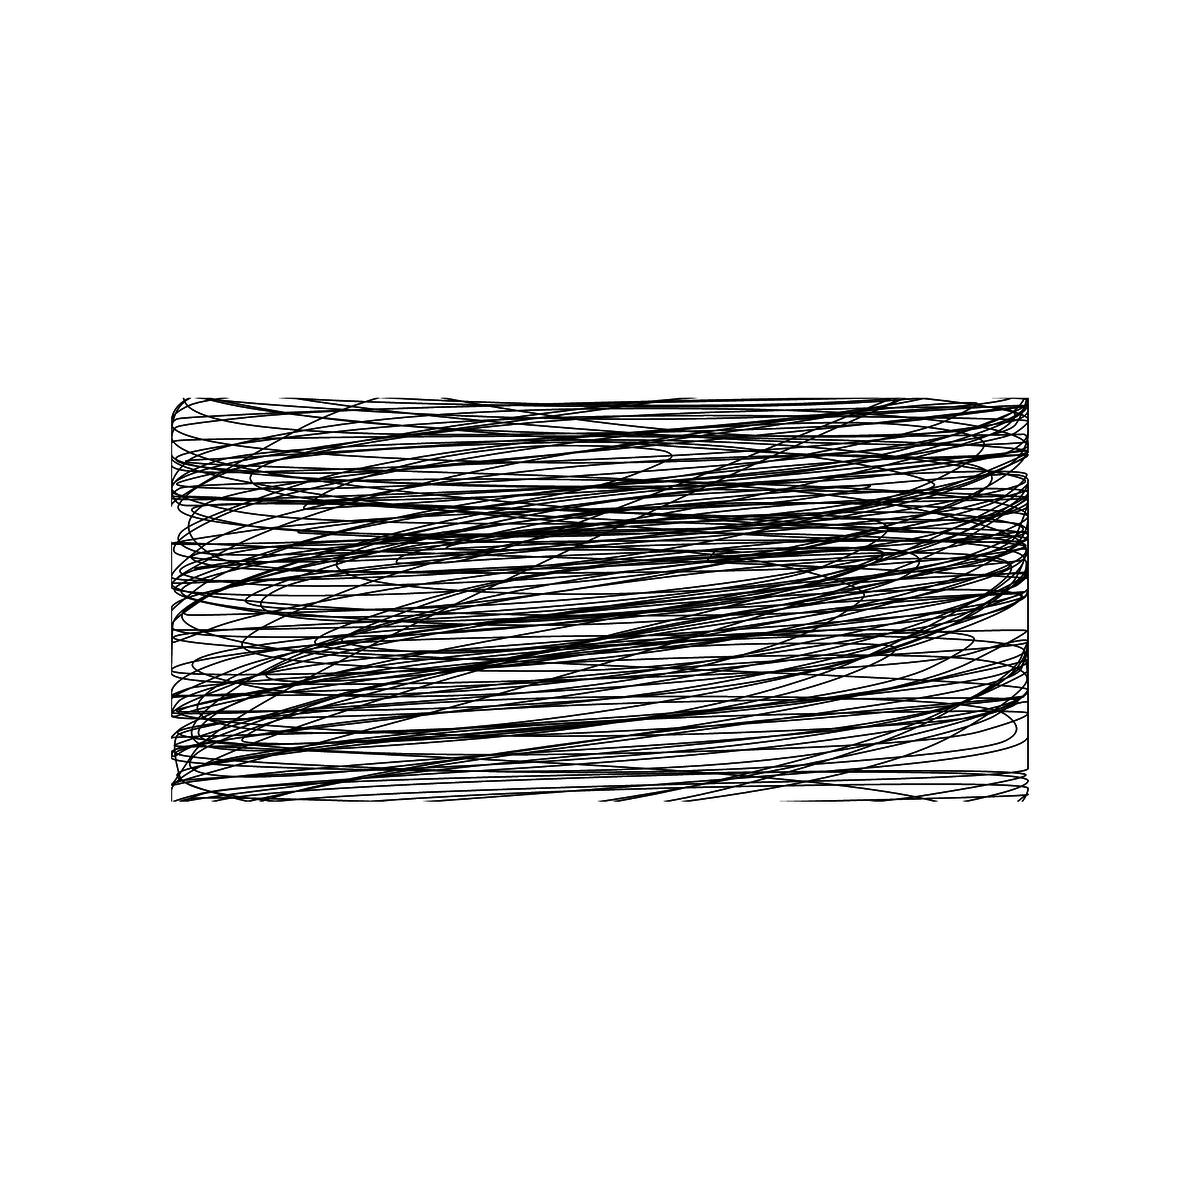 BAAAM drawing#17240 lat:32.5343475341796900lng: -117.1242370605468800